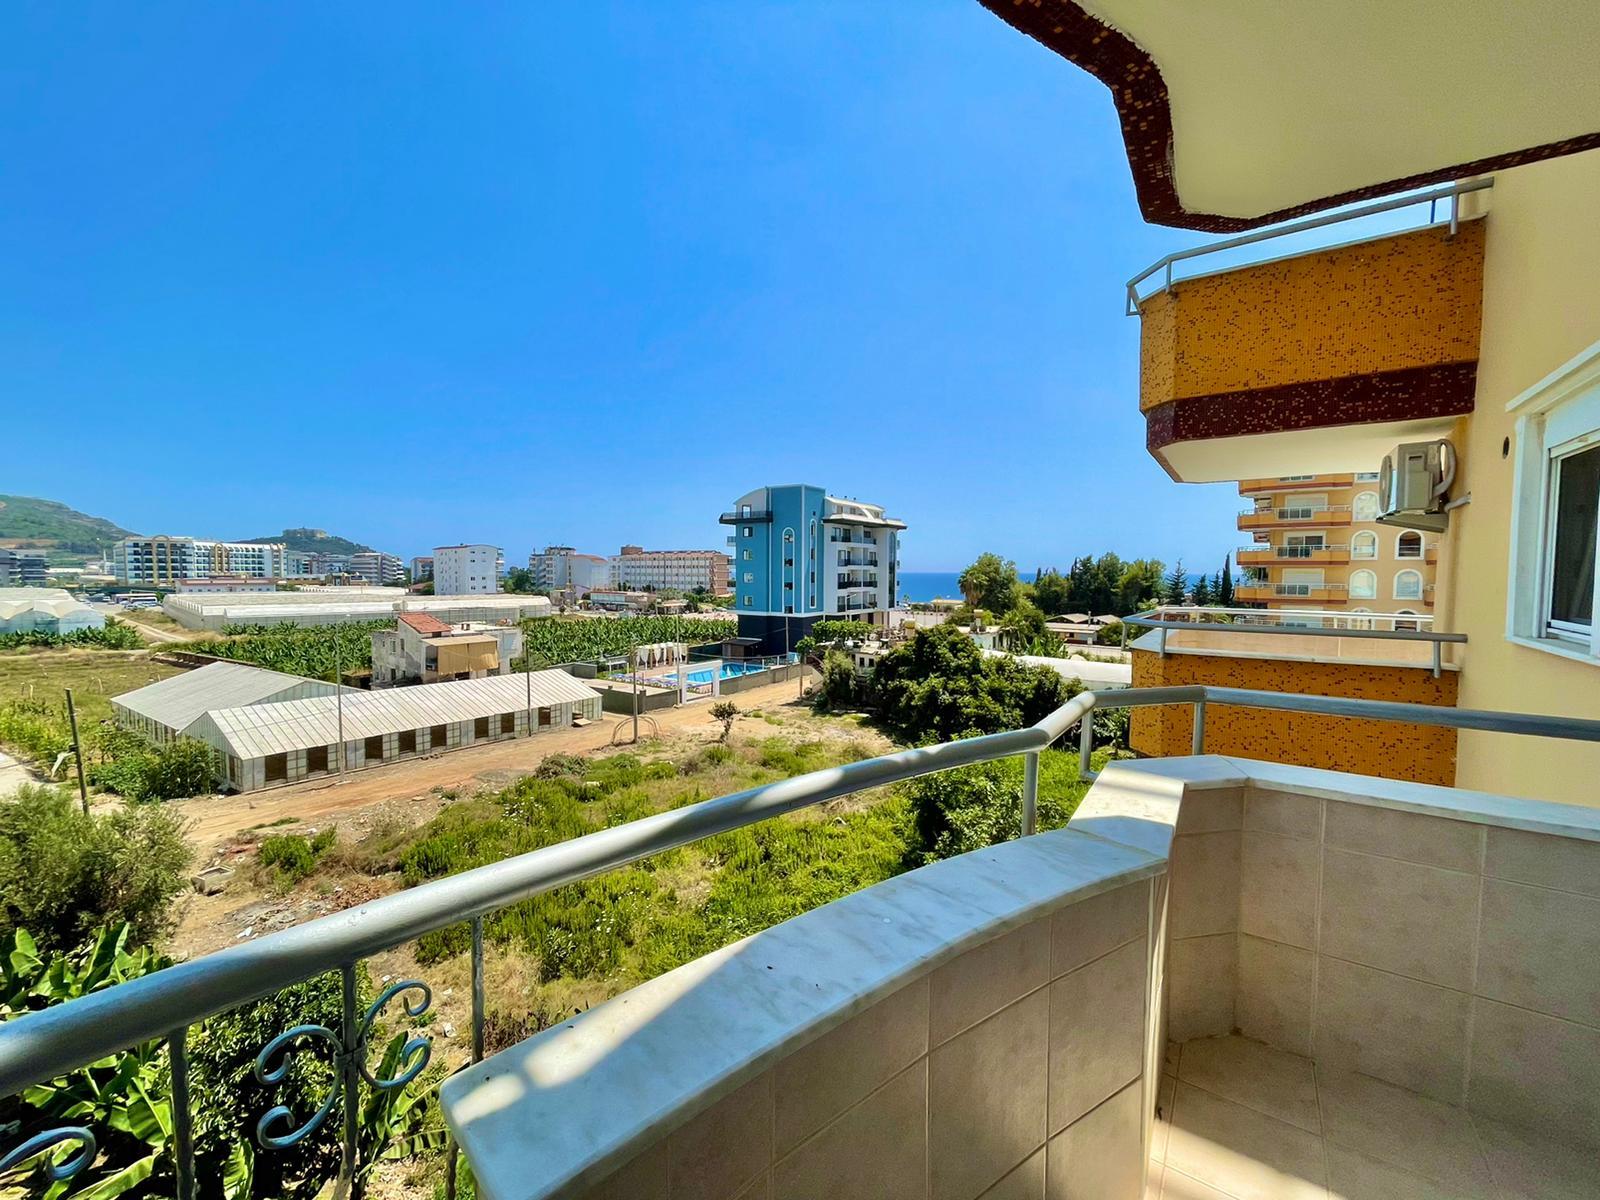 Трёхкомнатная квартира в «двух шагах» от Средиземного моря - Фото 25